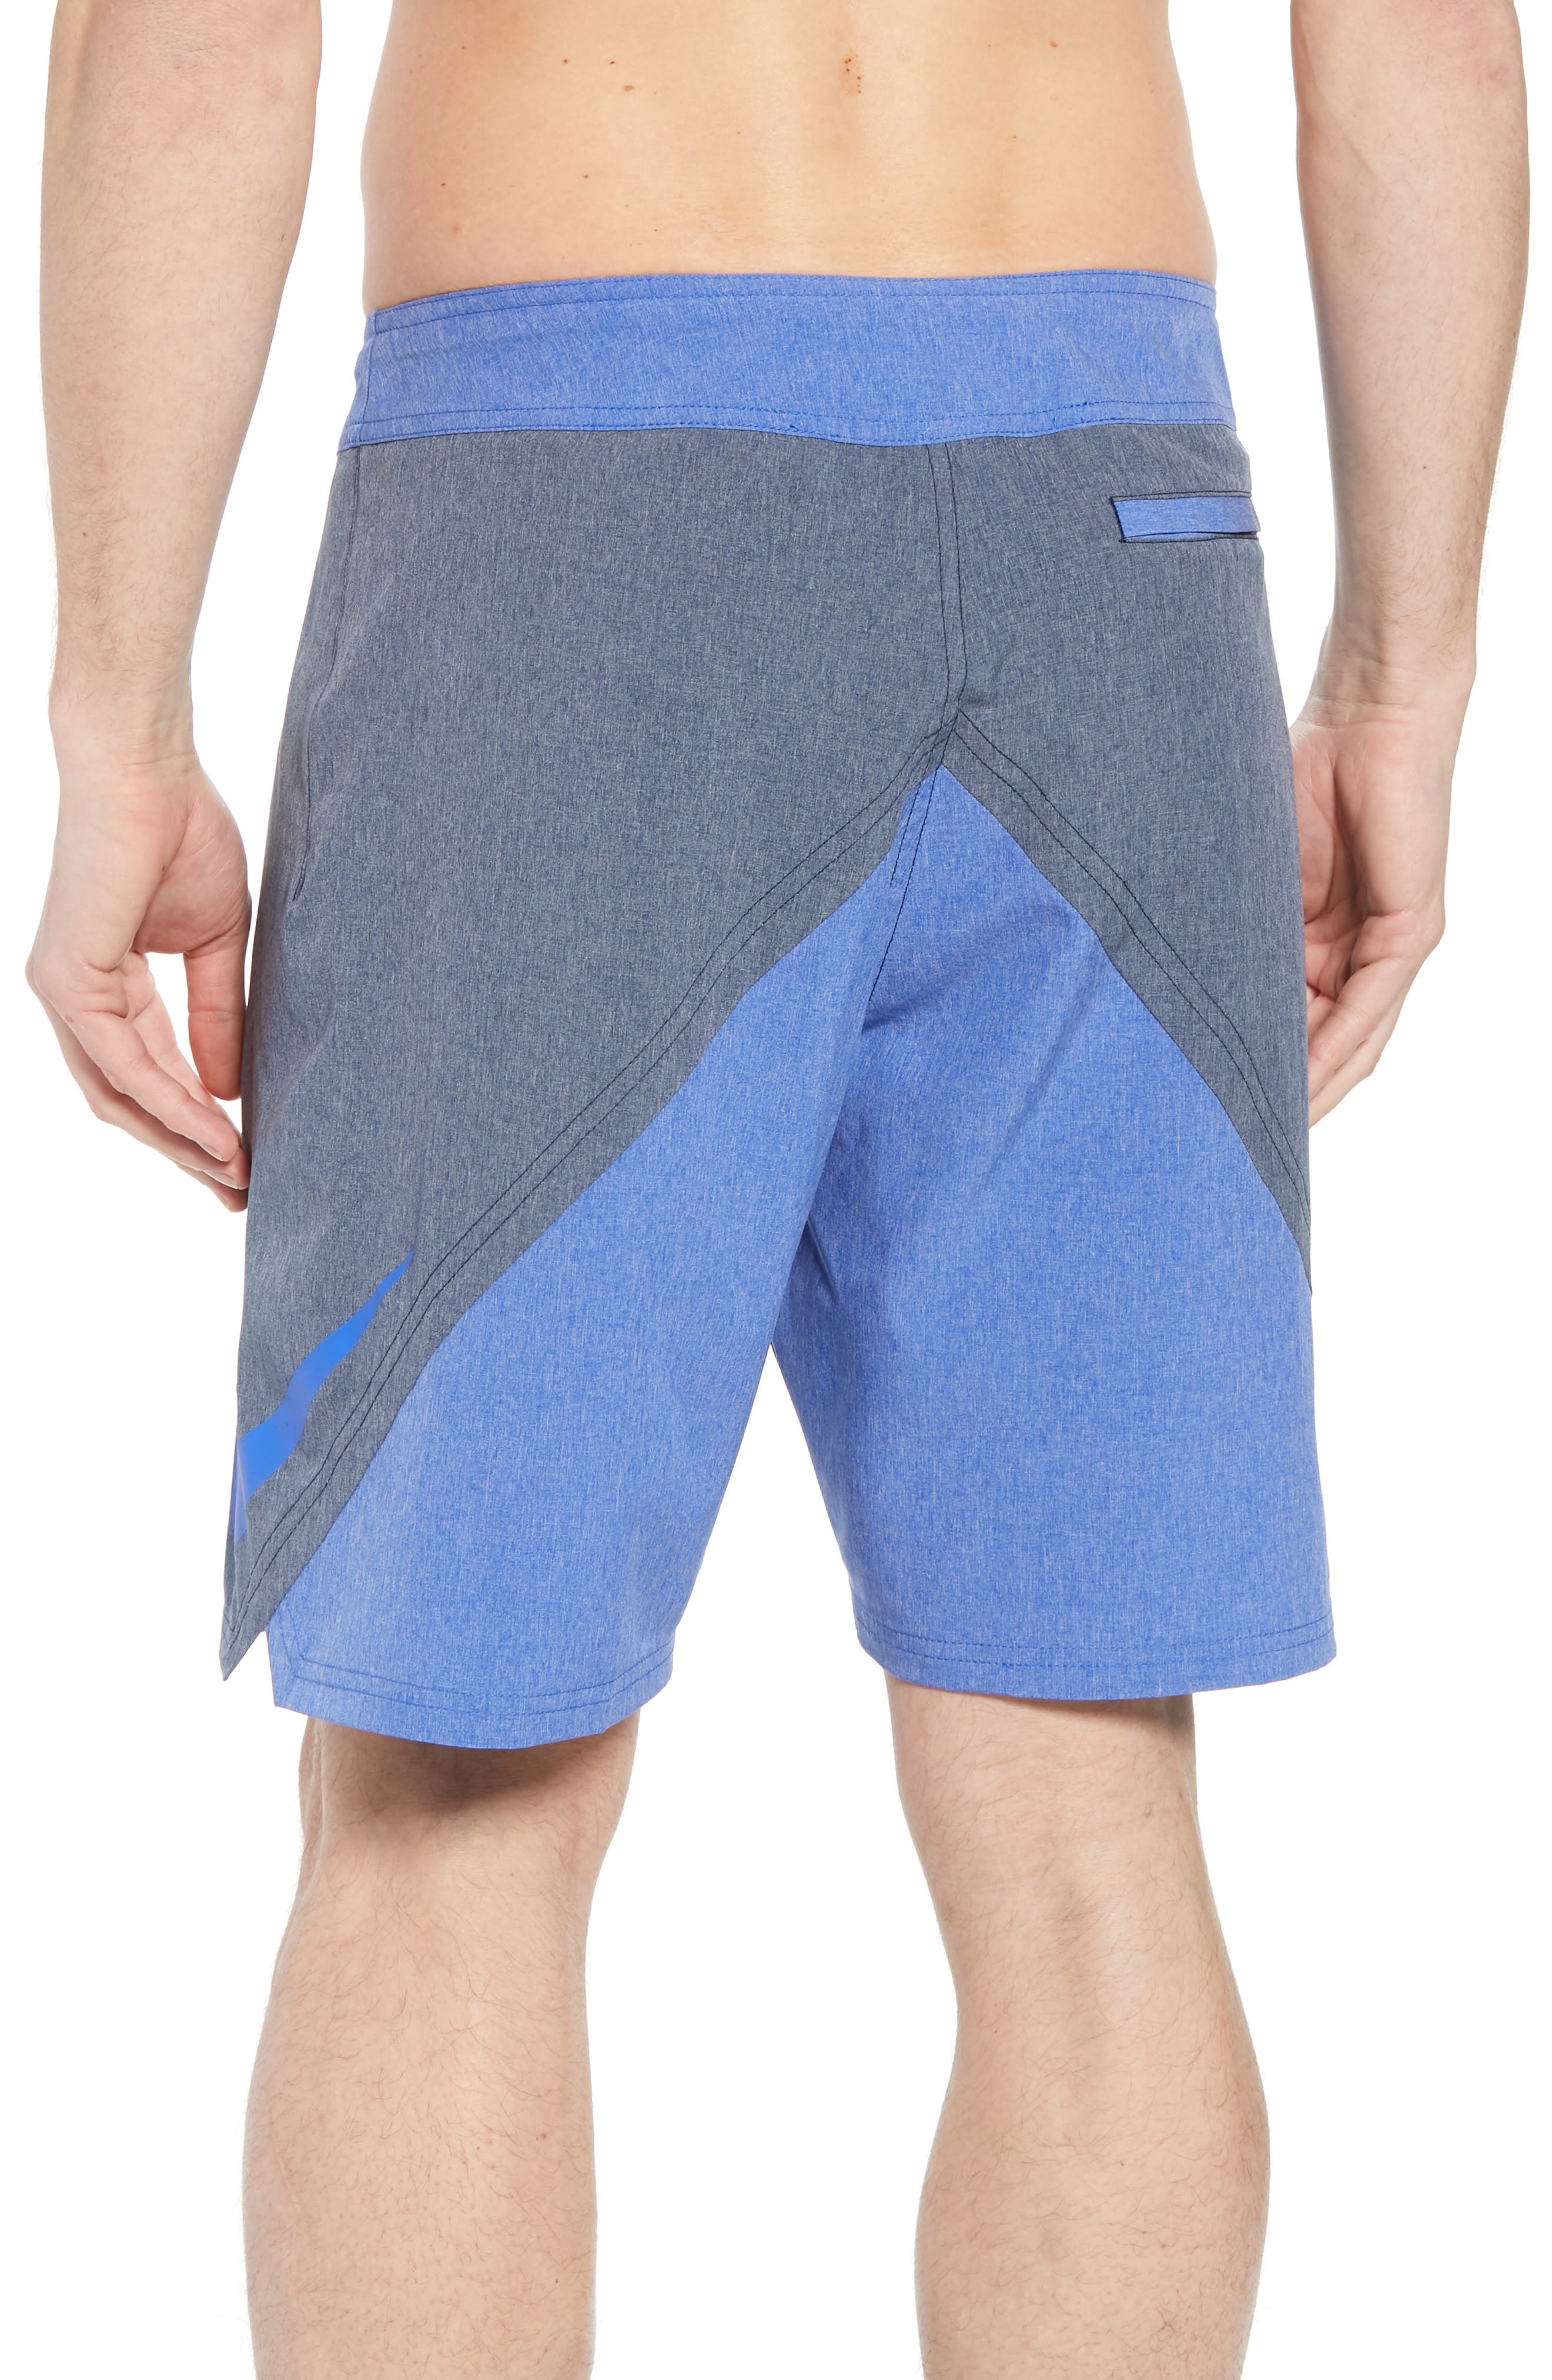 Vortex Board Shorts,                             Alternate thumbnail 3, color,                             Obsidian